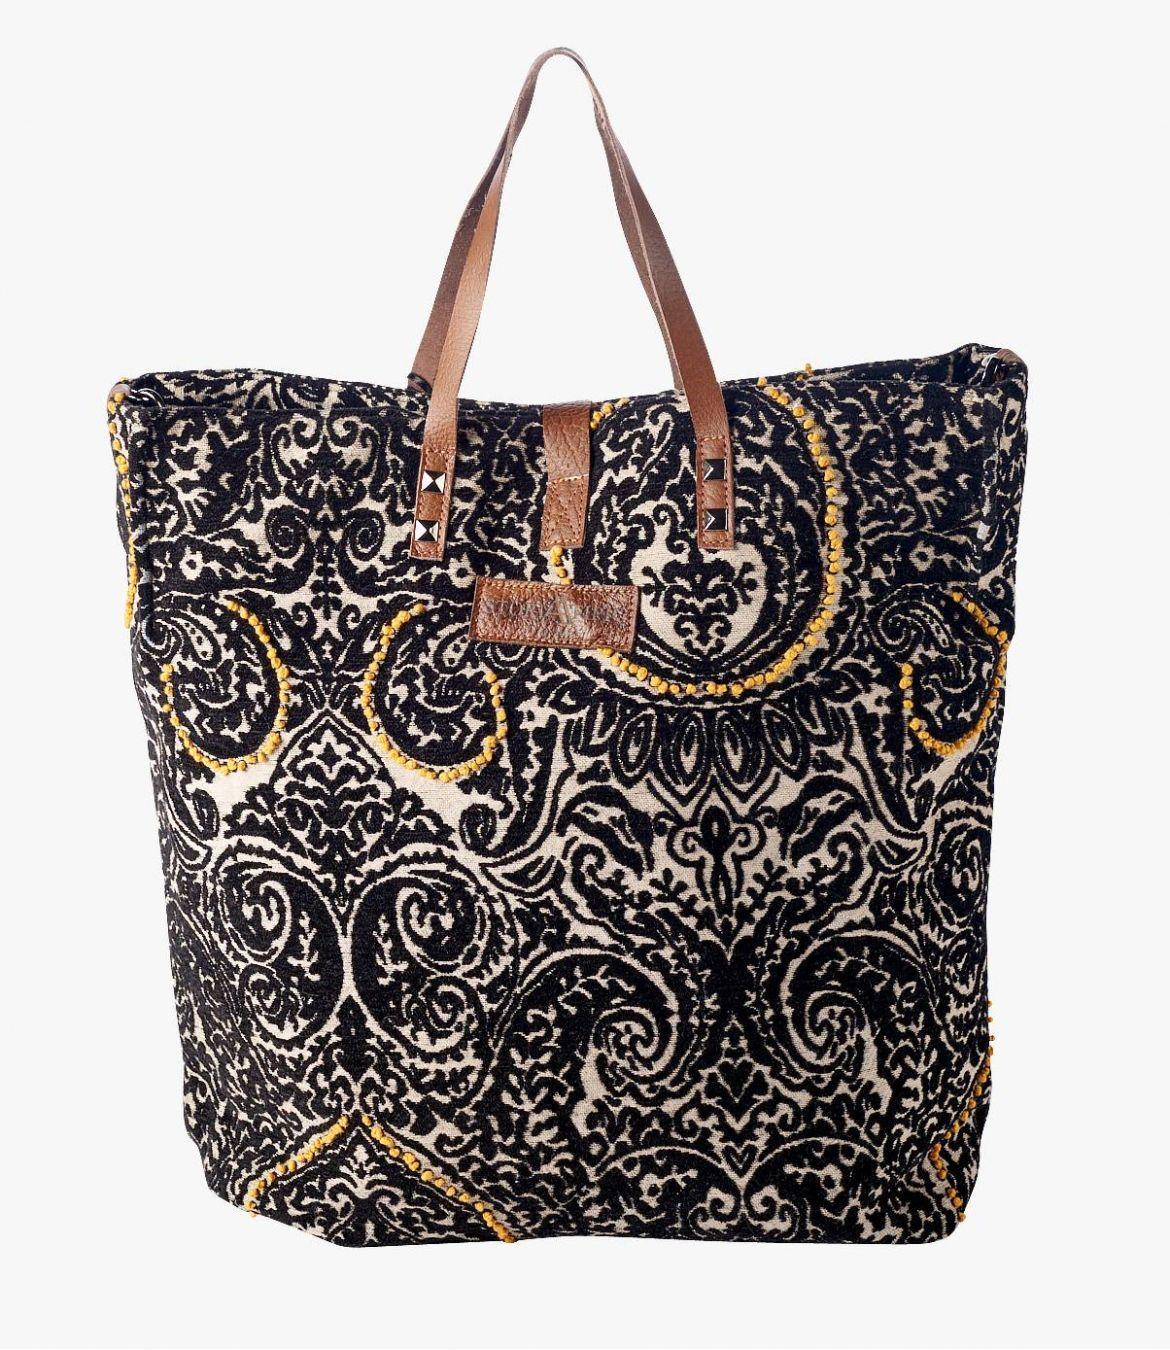 HAPPY IMP Cotton Bag, Women's Leather 40x34x15 cm Storiatipic - 6